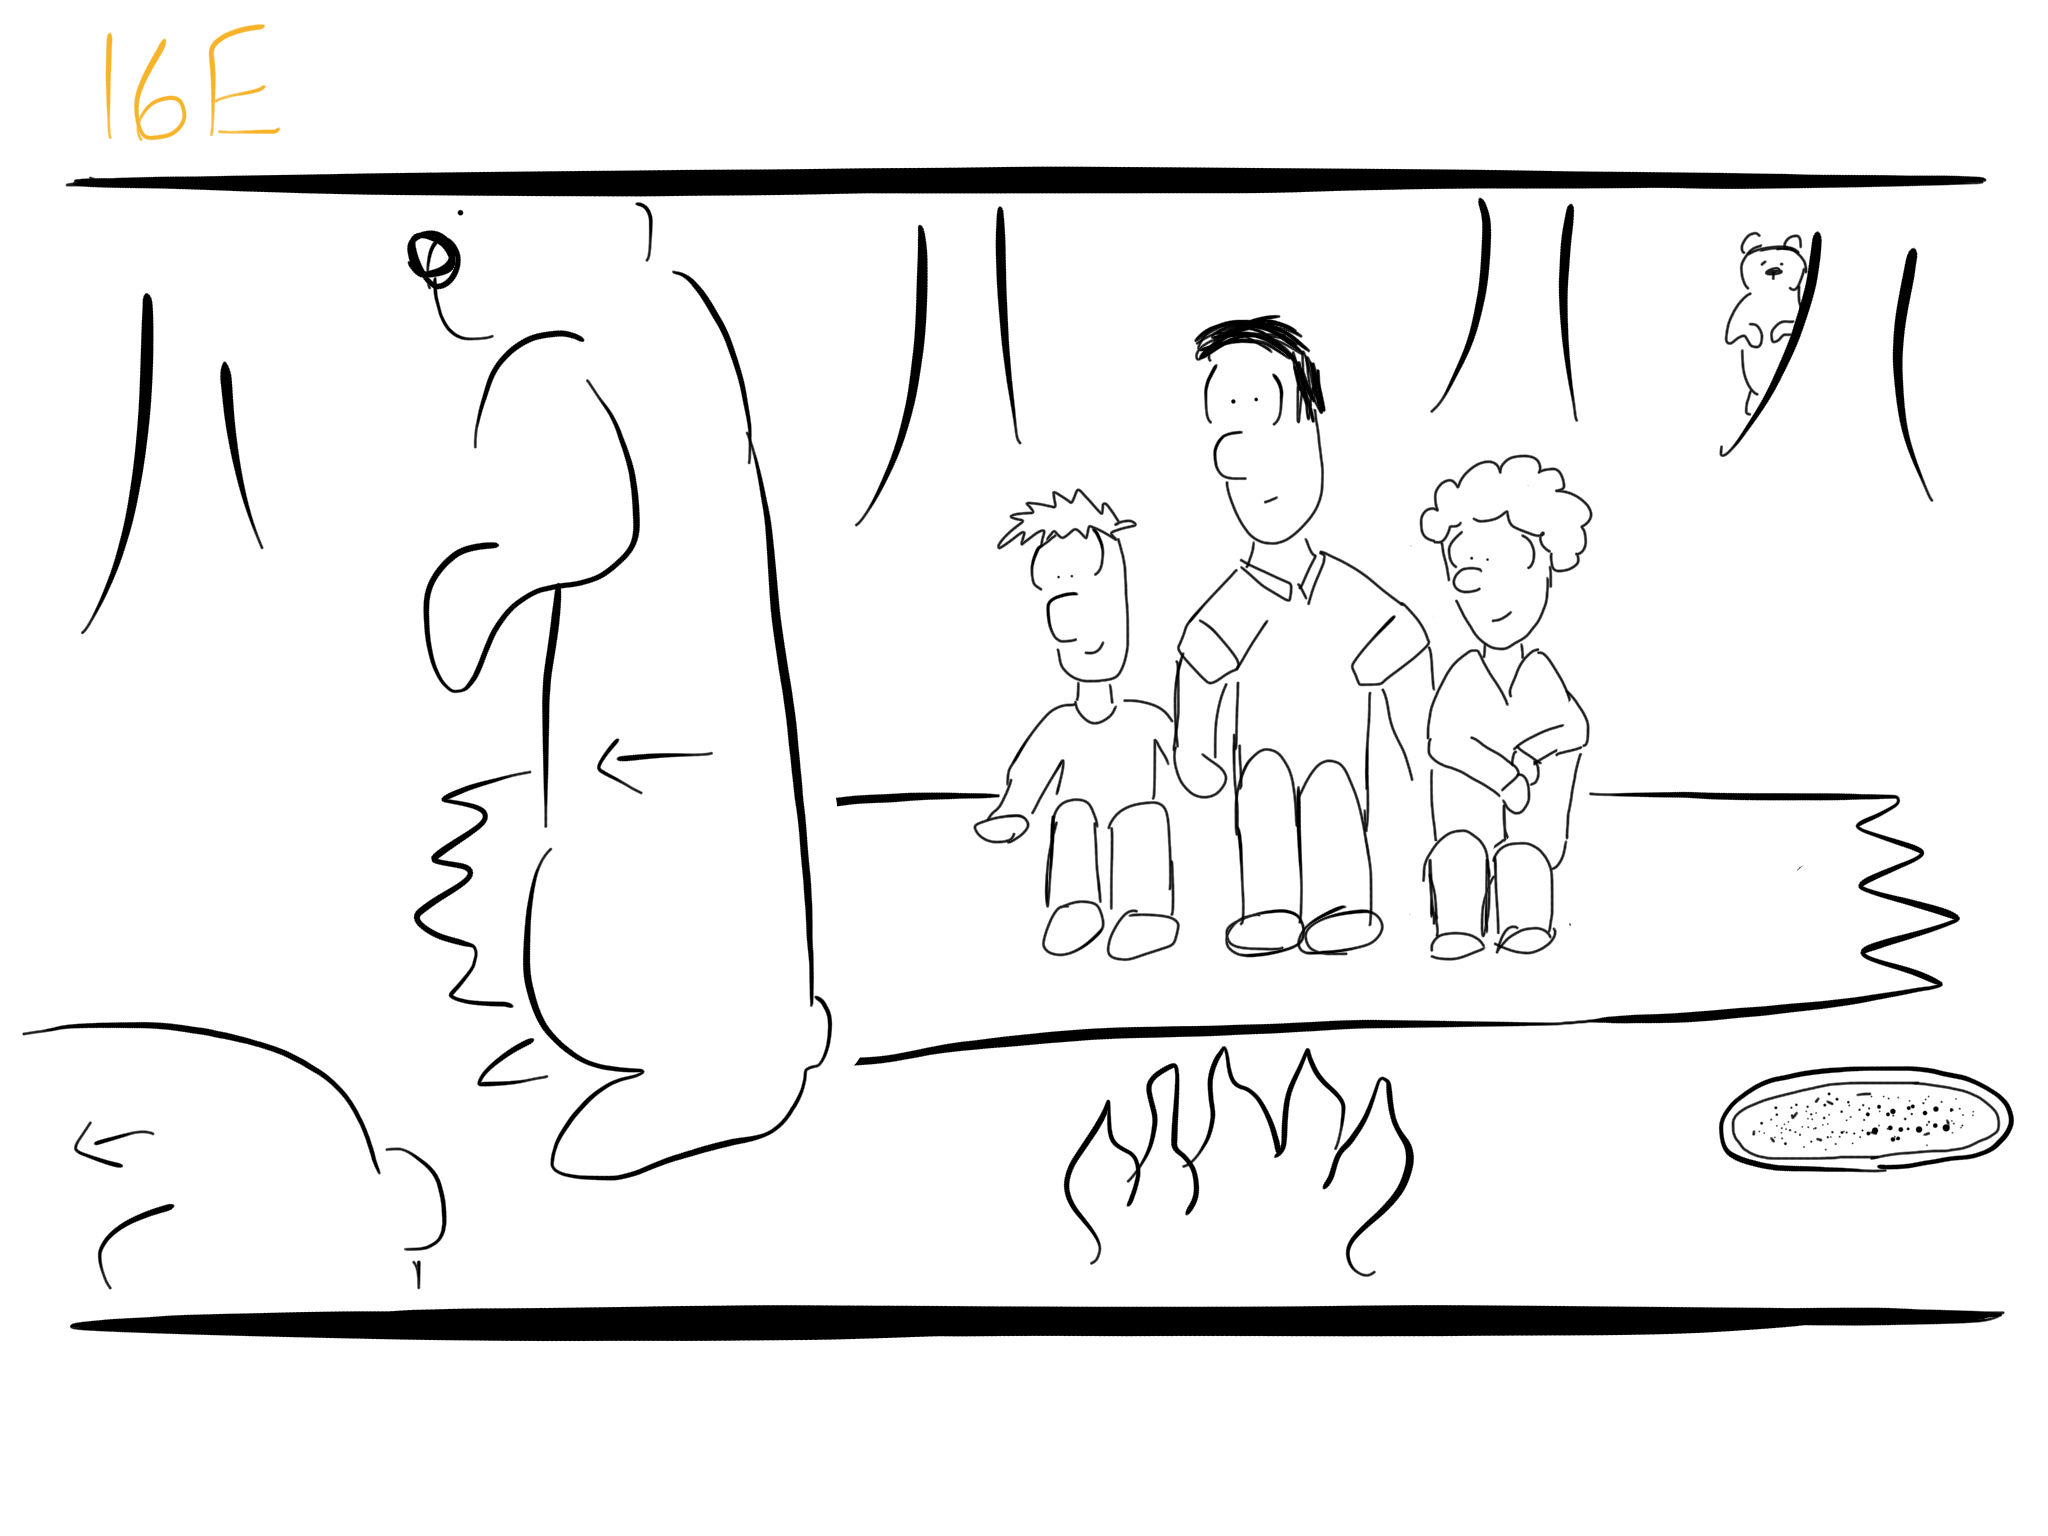 BDF_Storyboards_66.jpg